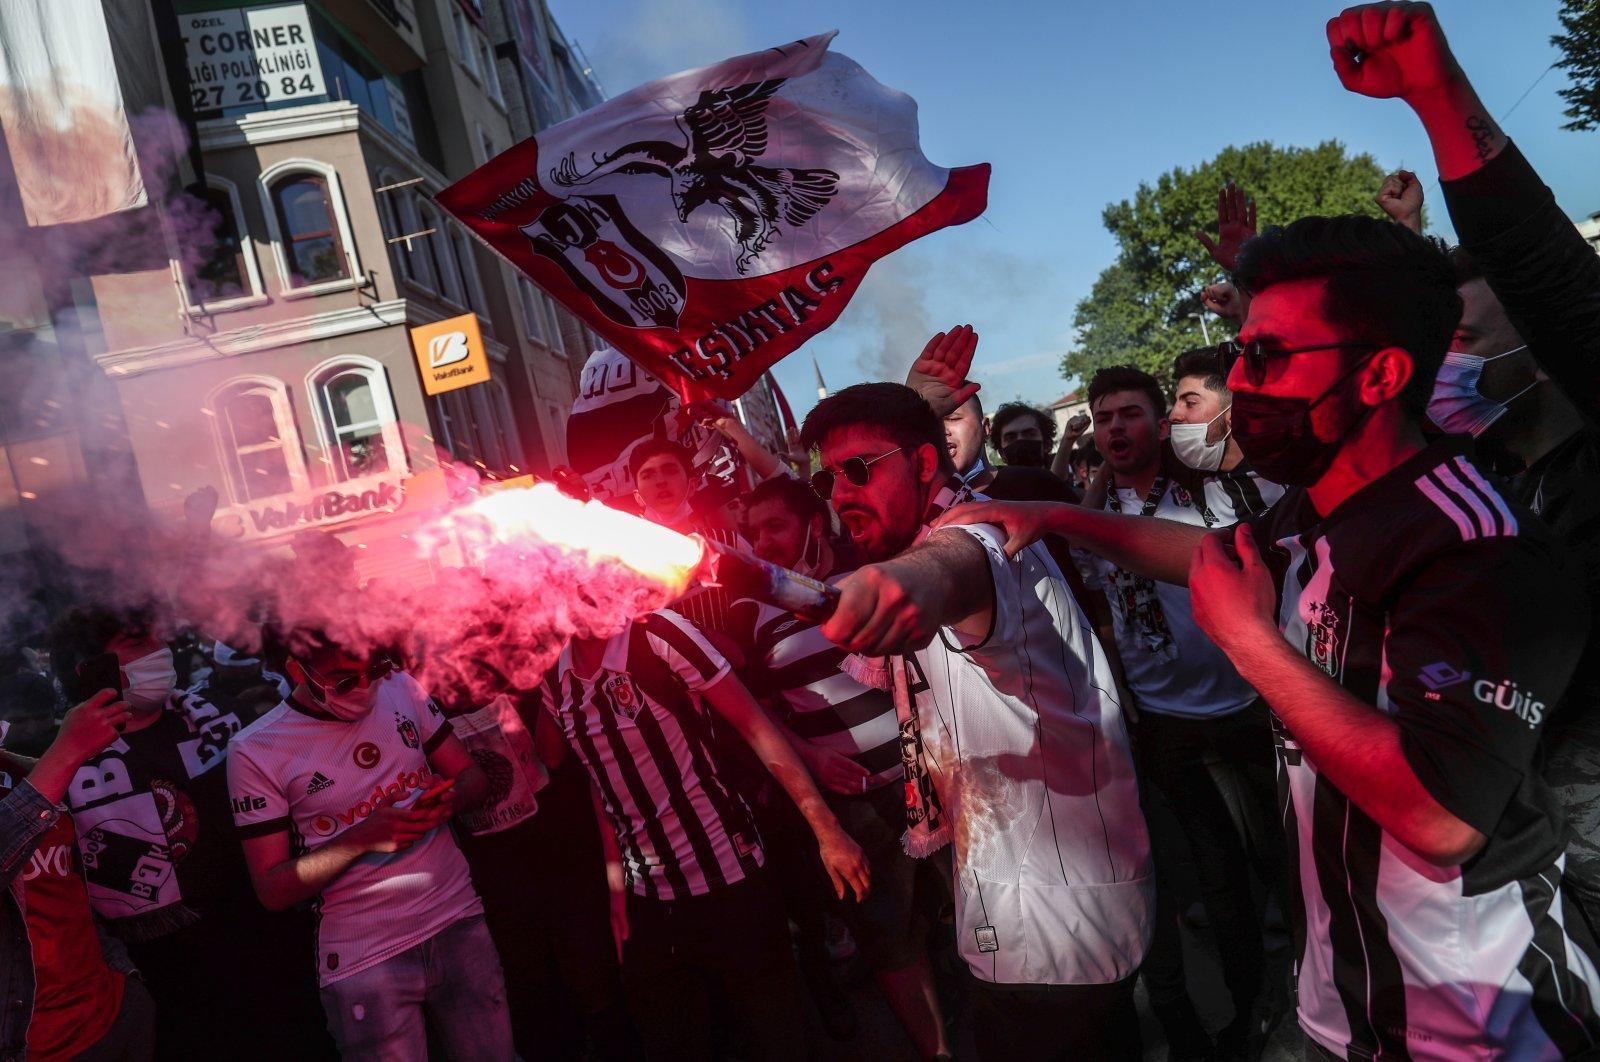 Beşiktaş fans celebrate winning the Turkish Süper Lig before the trophy ceremony in Istanbul, Turkey, May 19, 2021. (EPA Photo)